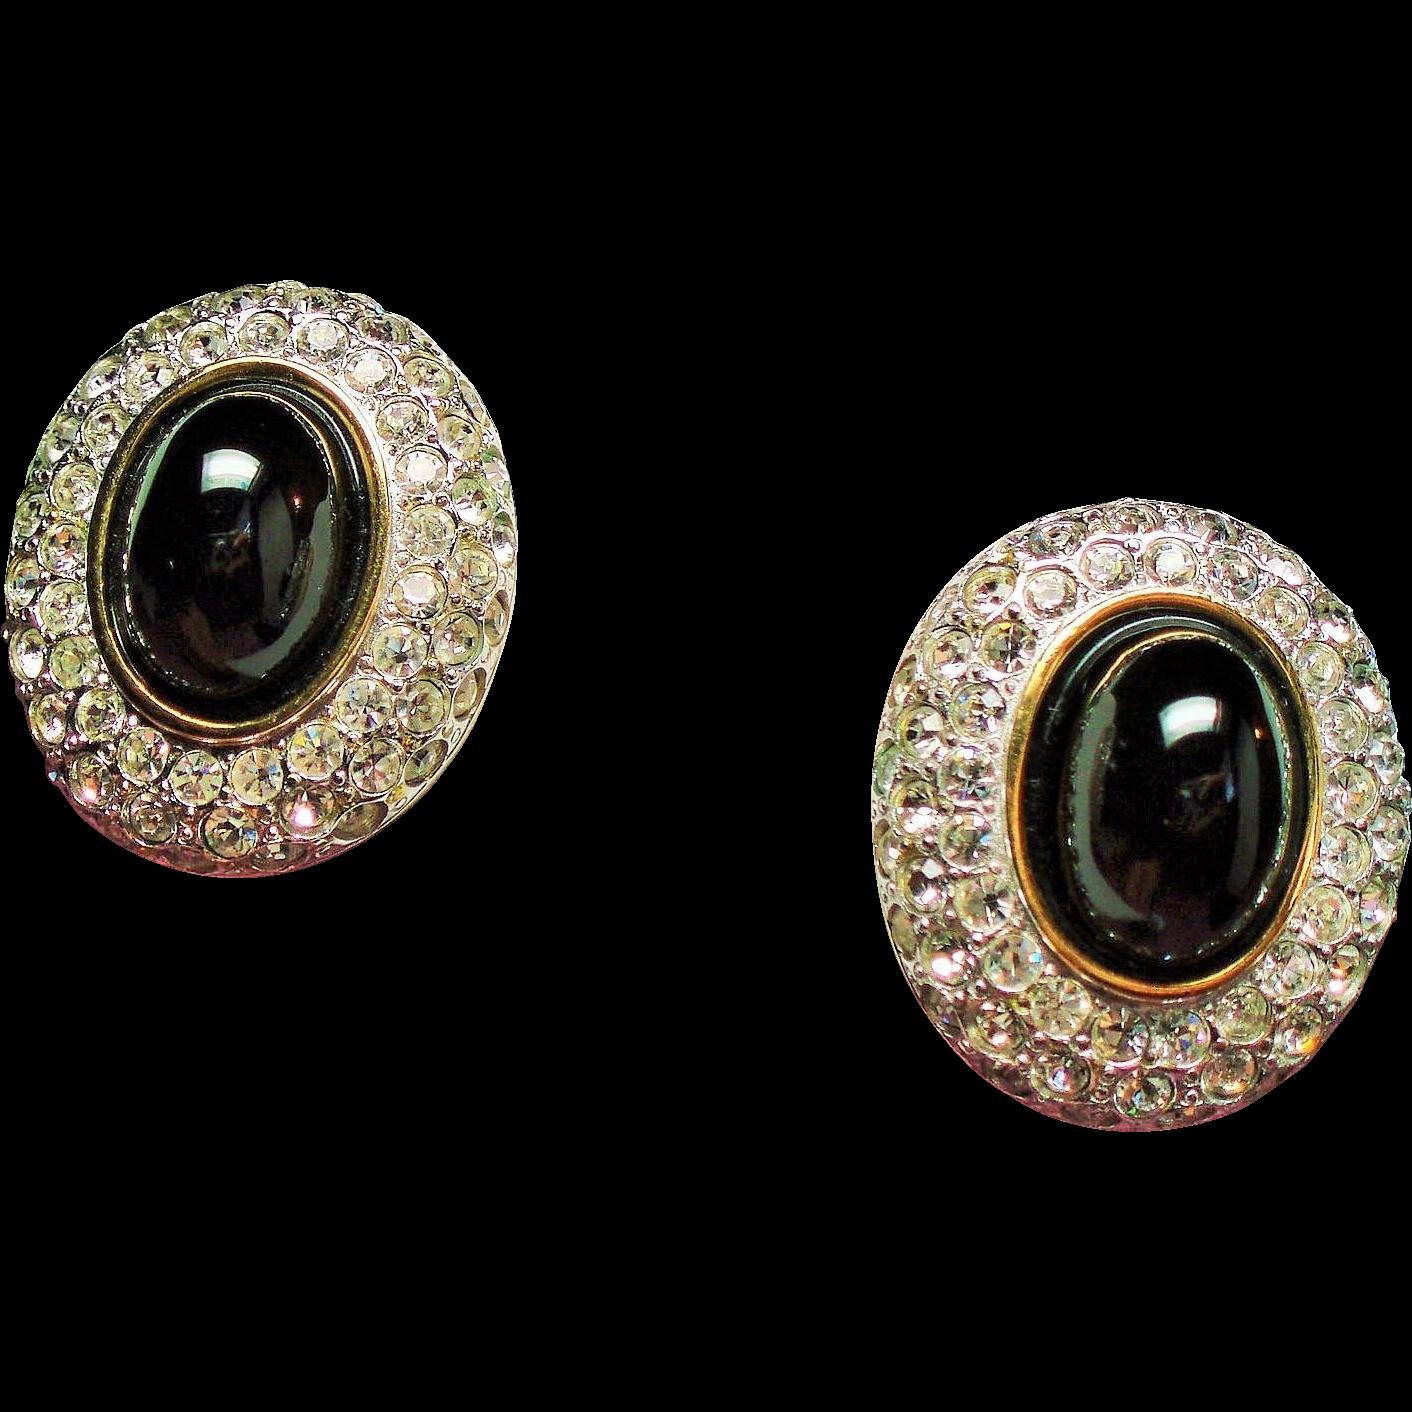 Vintage Designer Black Glass Cabochon Pave Rhinestone Earrings